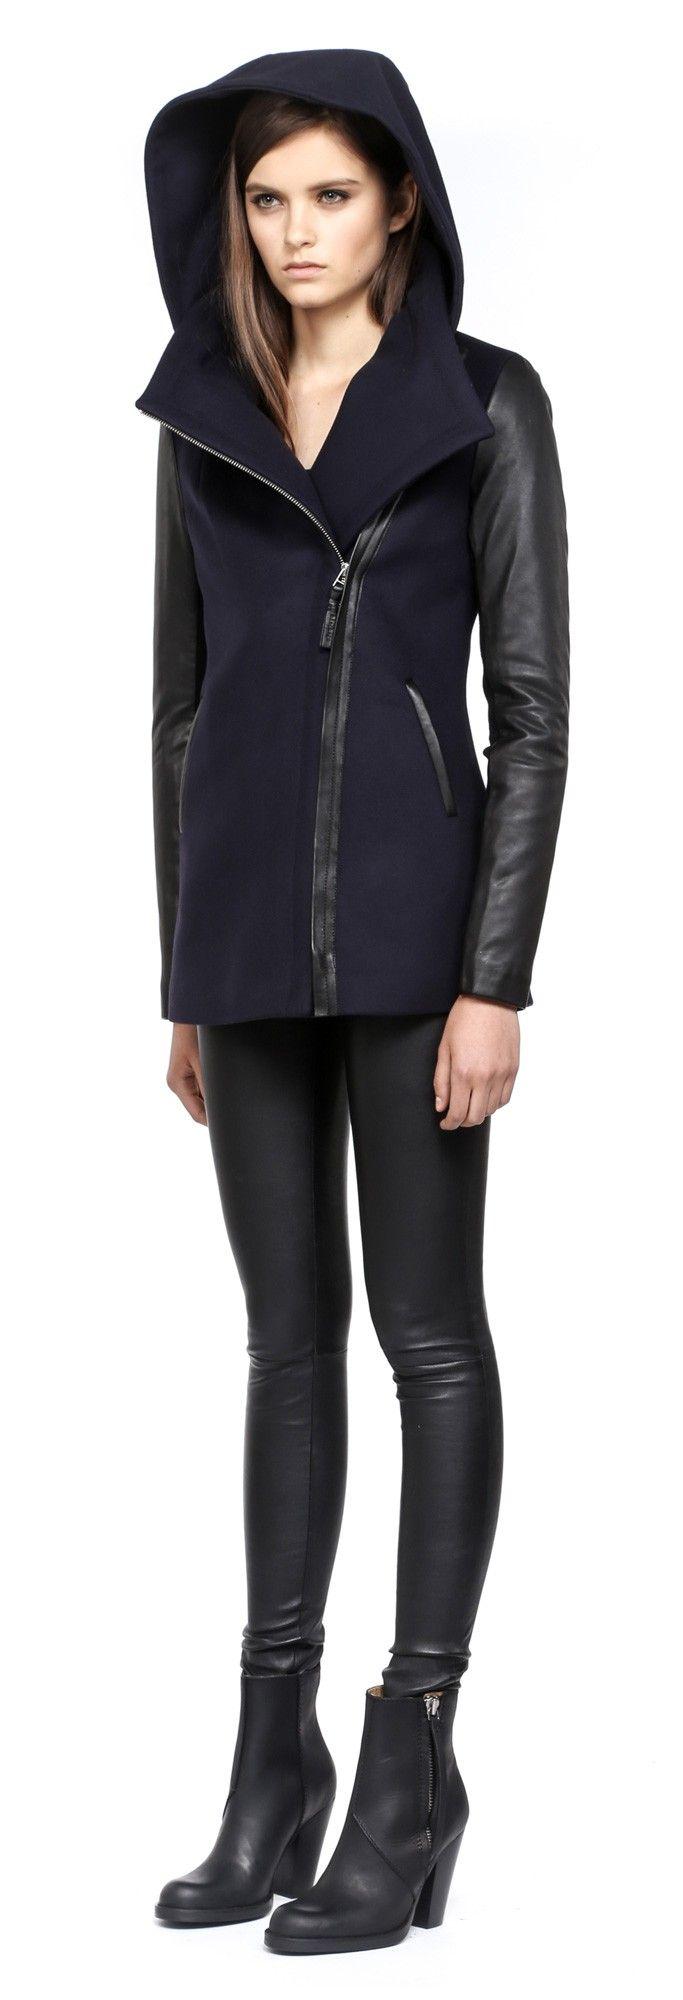 Wool Jacket Leather Sleeves